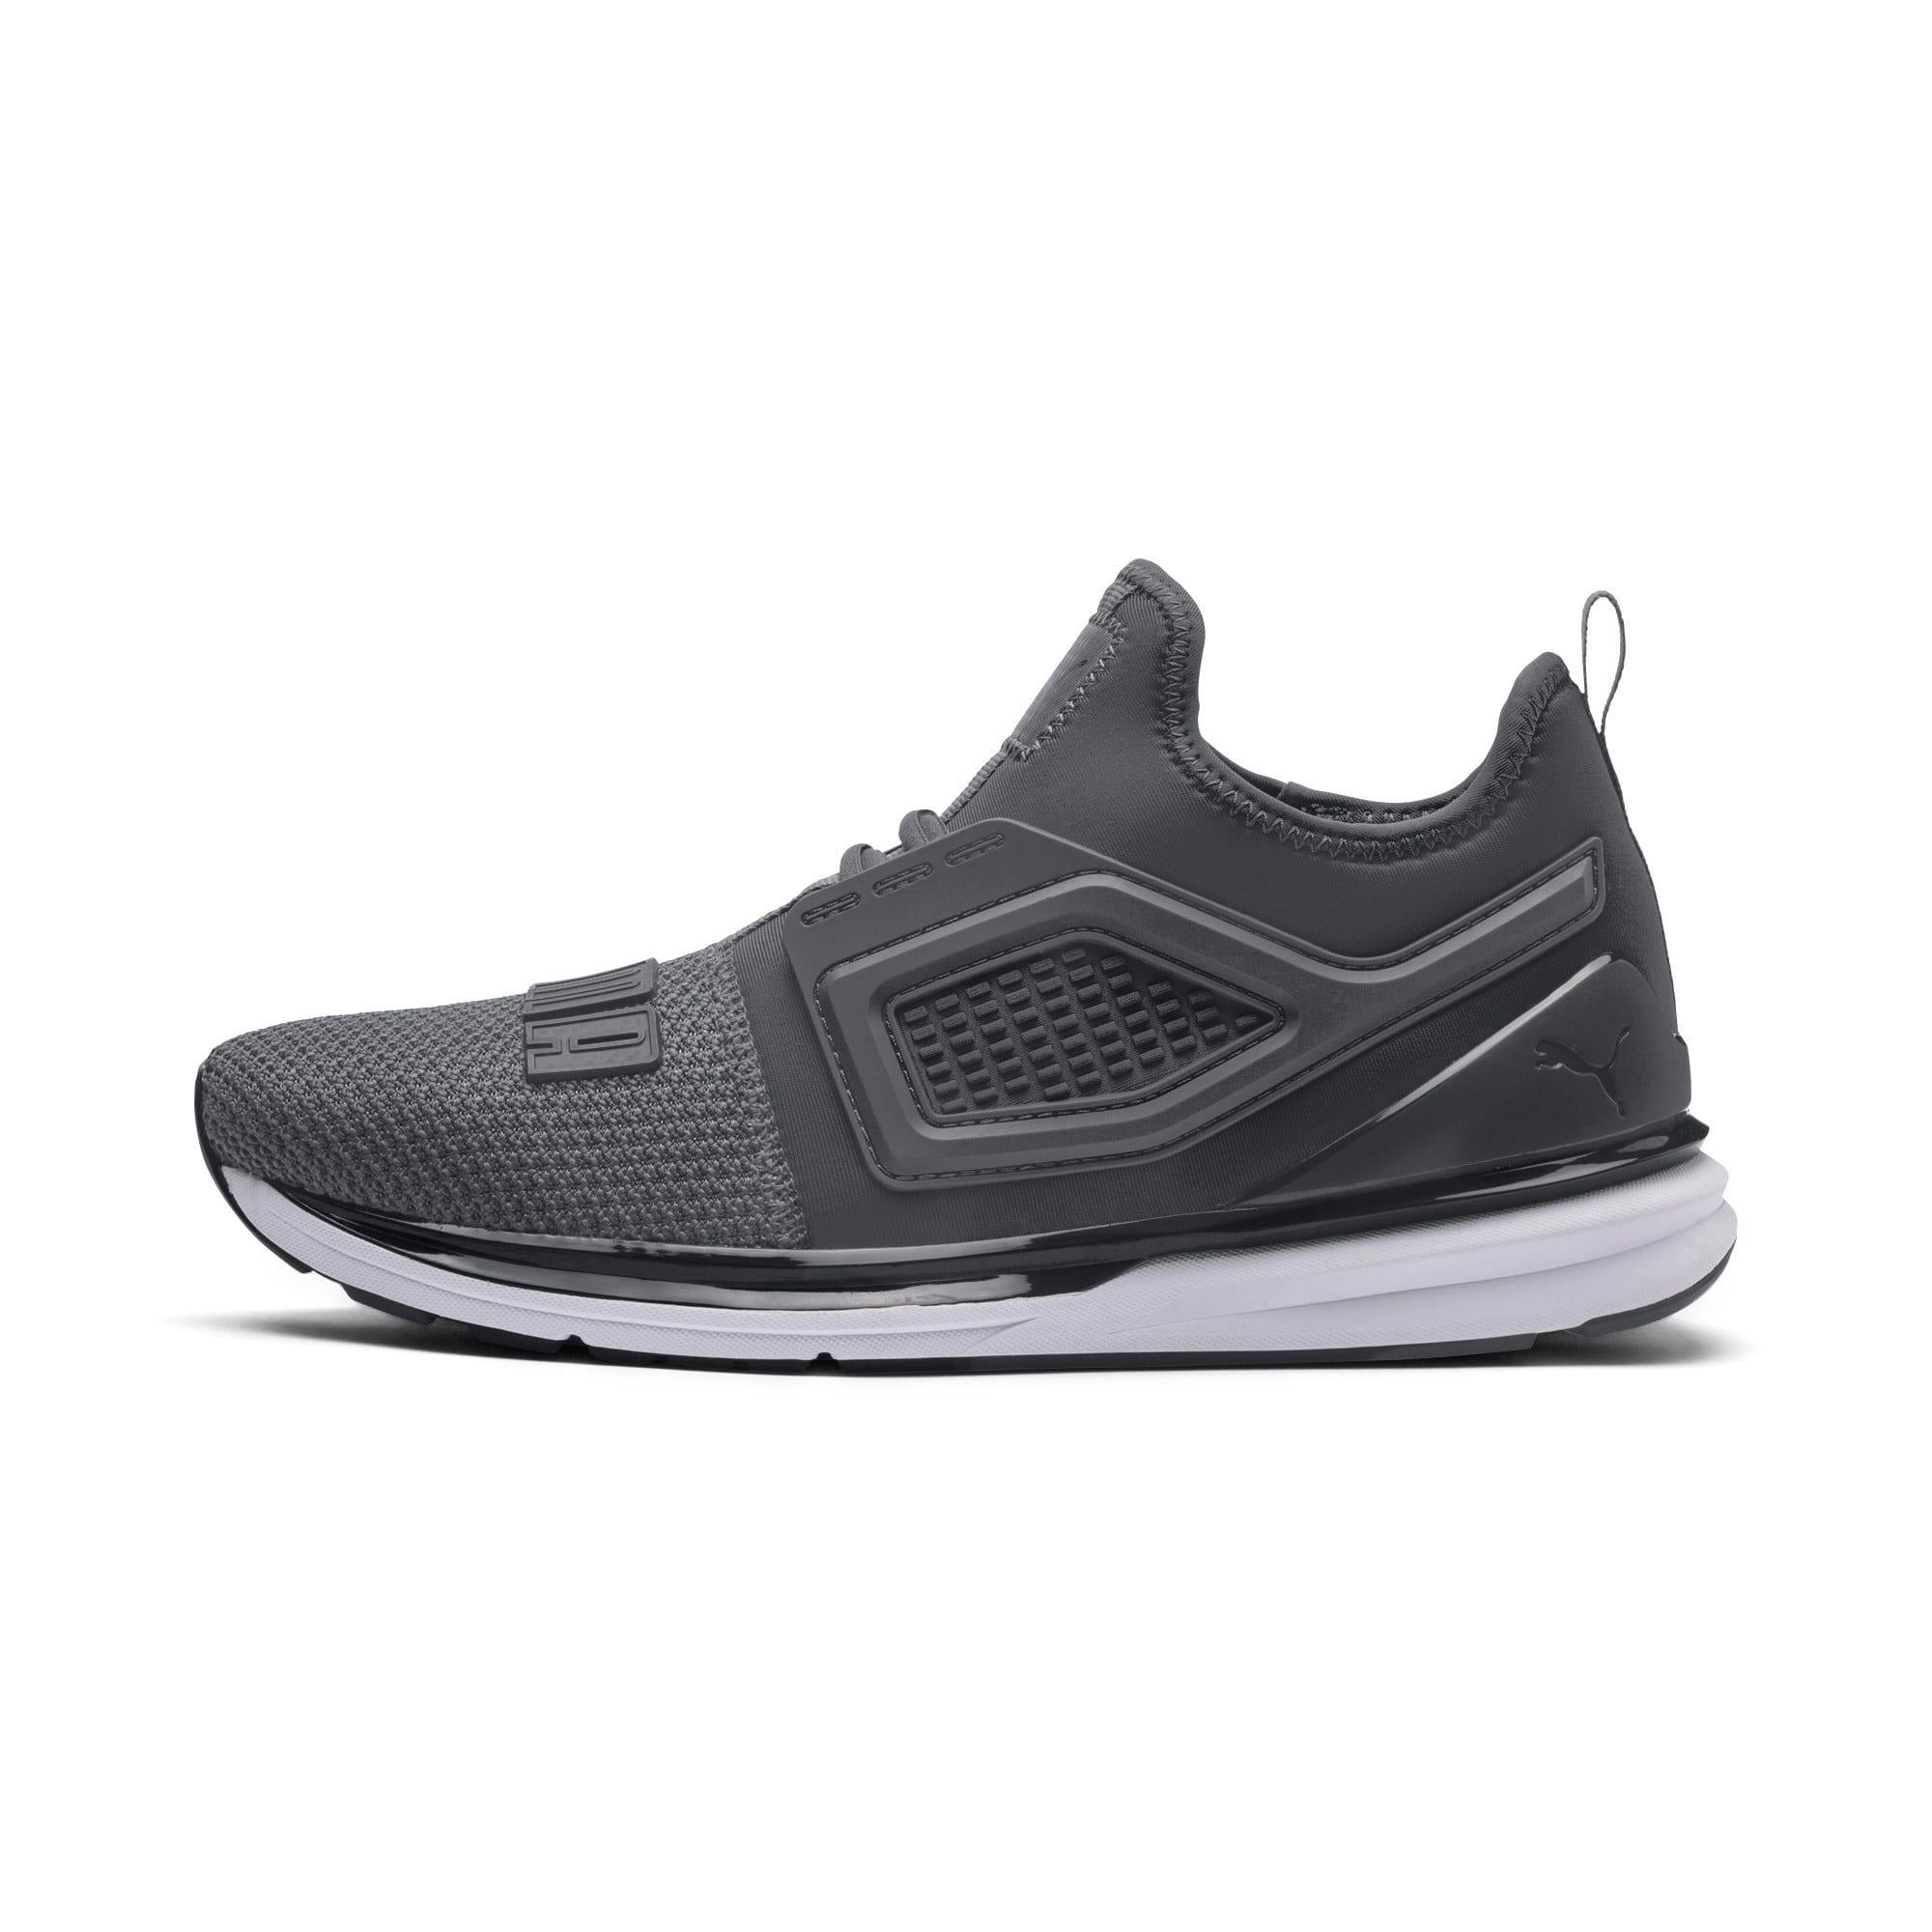 Thumbnail 1 of IGNITE Limitless 2 Running Shoes, Iron Gate-Puma Black, medium